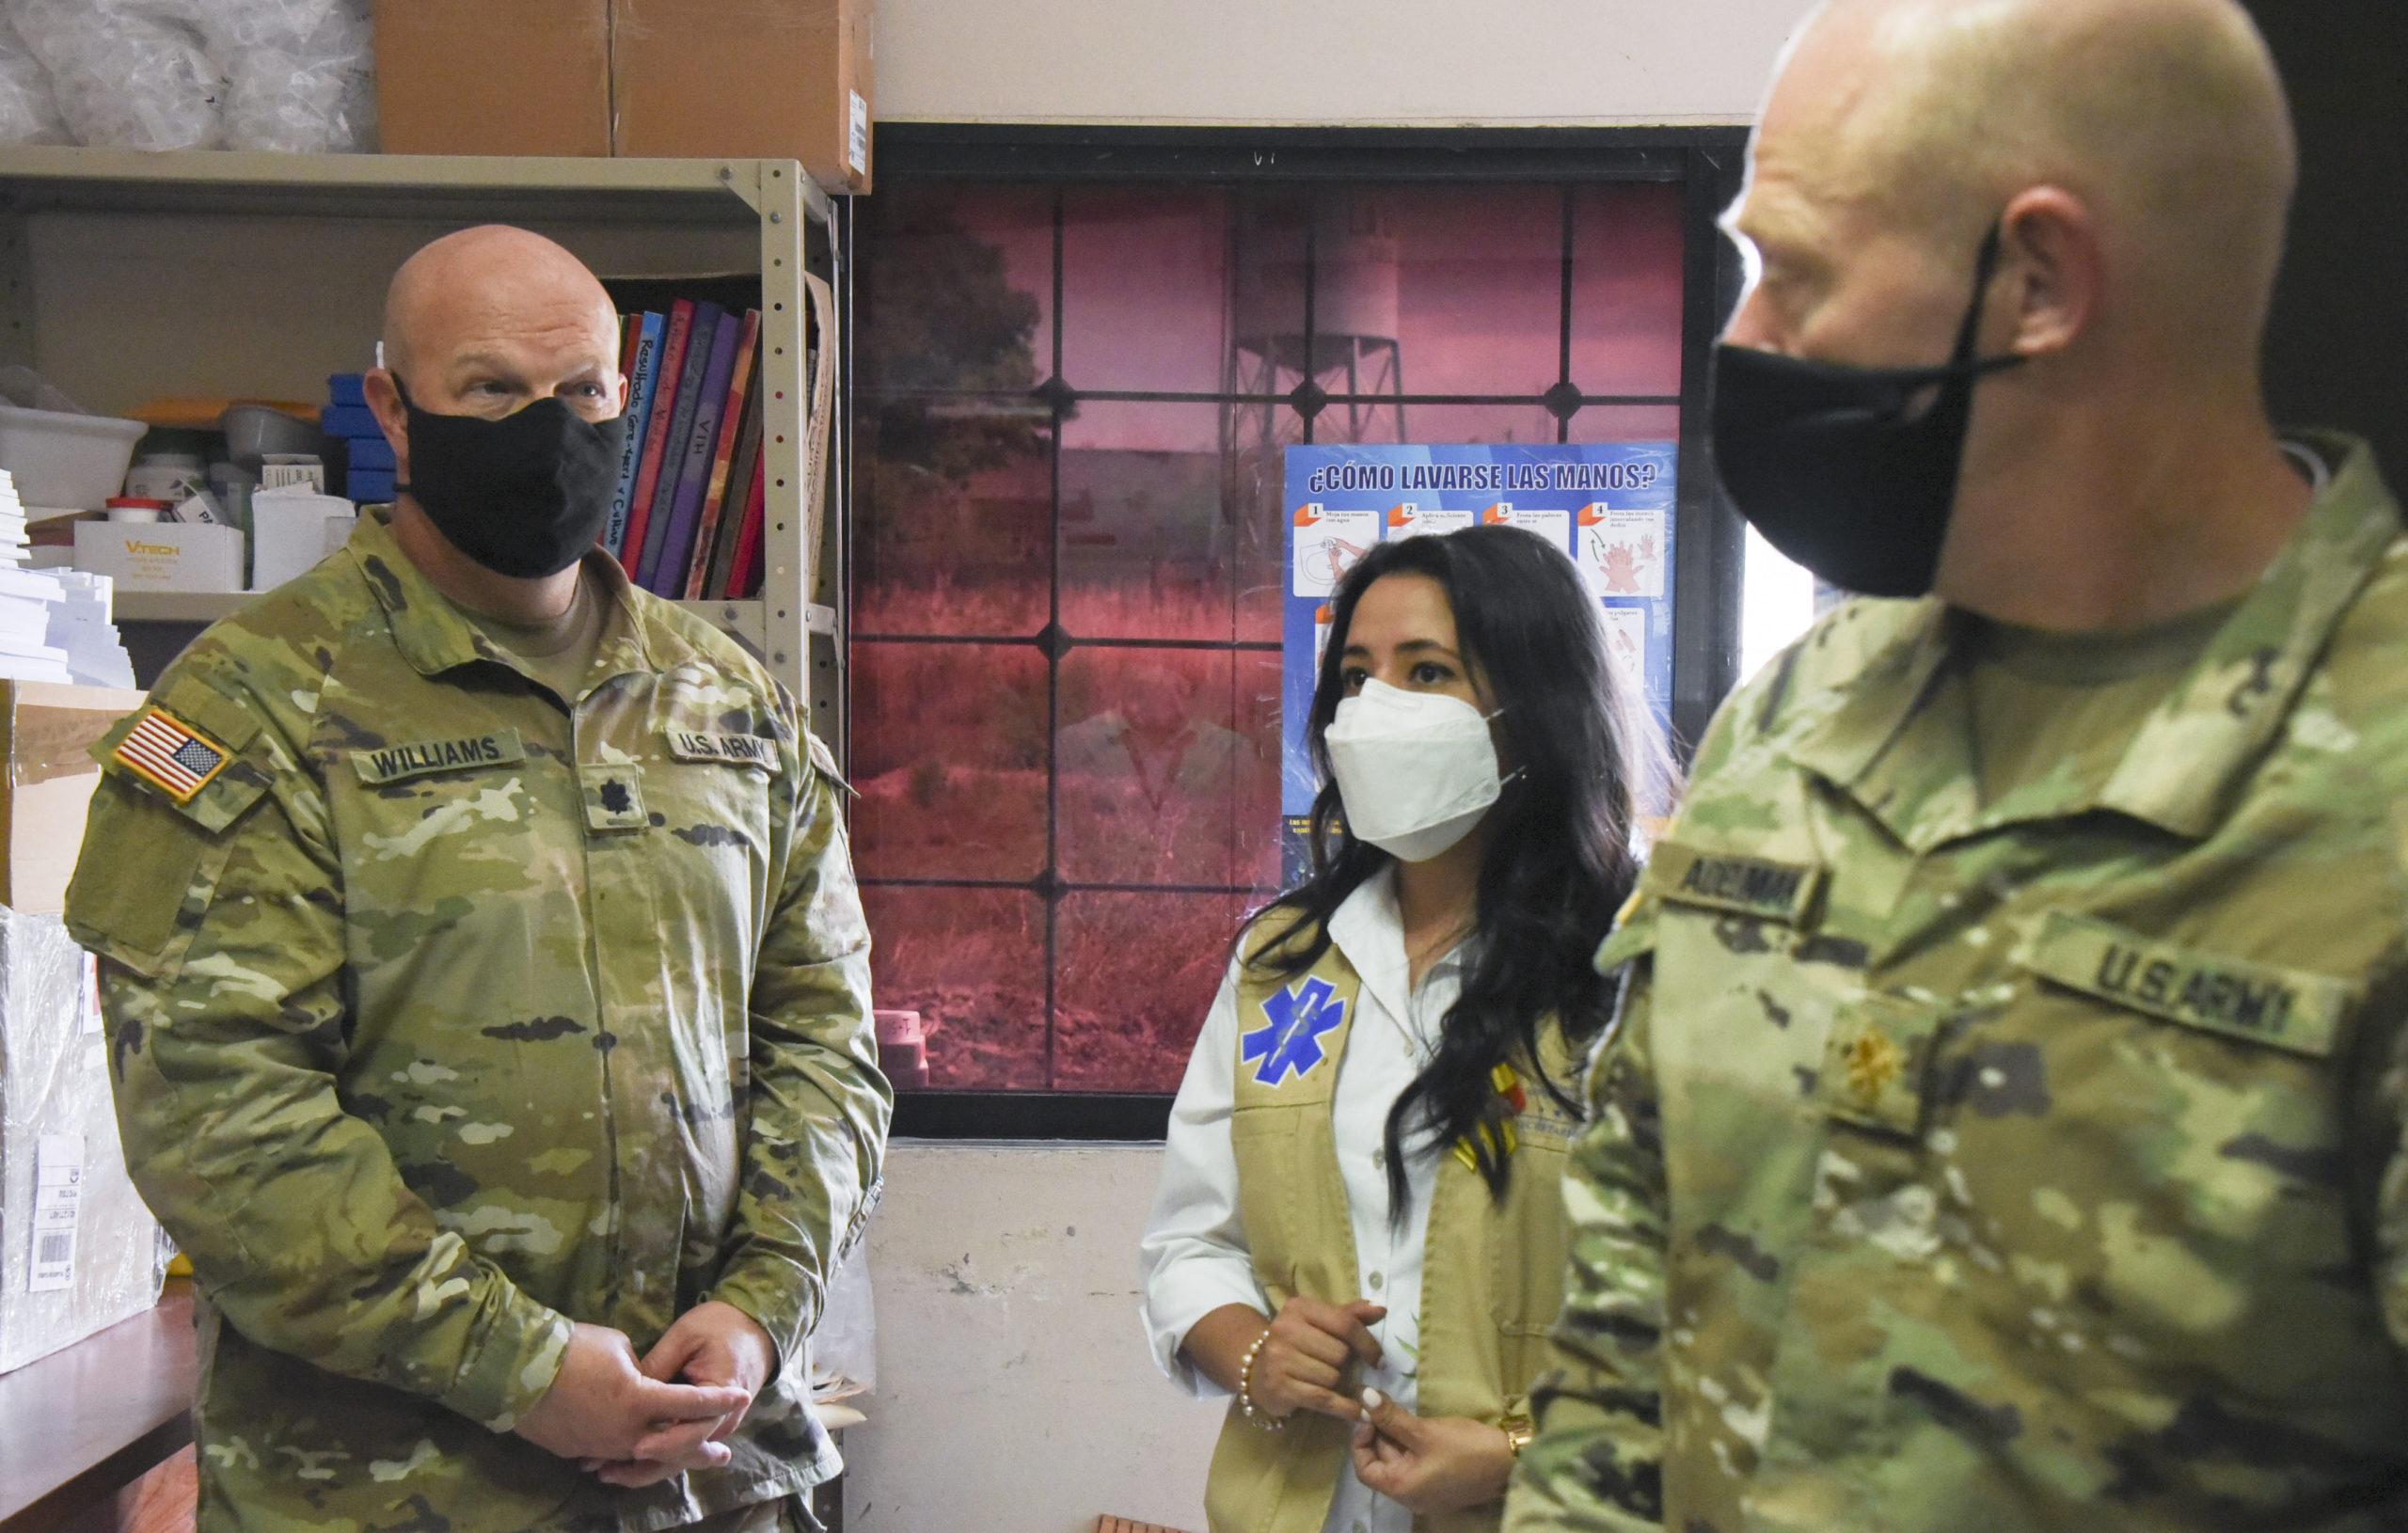 JTF-Bravo Donates Foggers to Fight Dengue in La Paz, Honduras